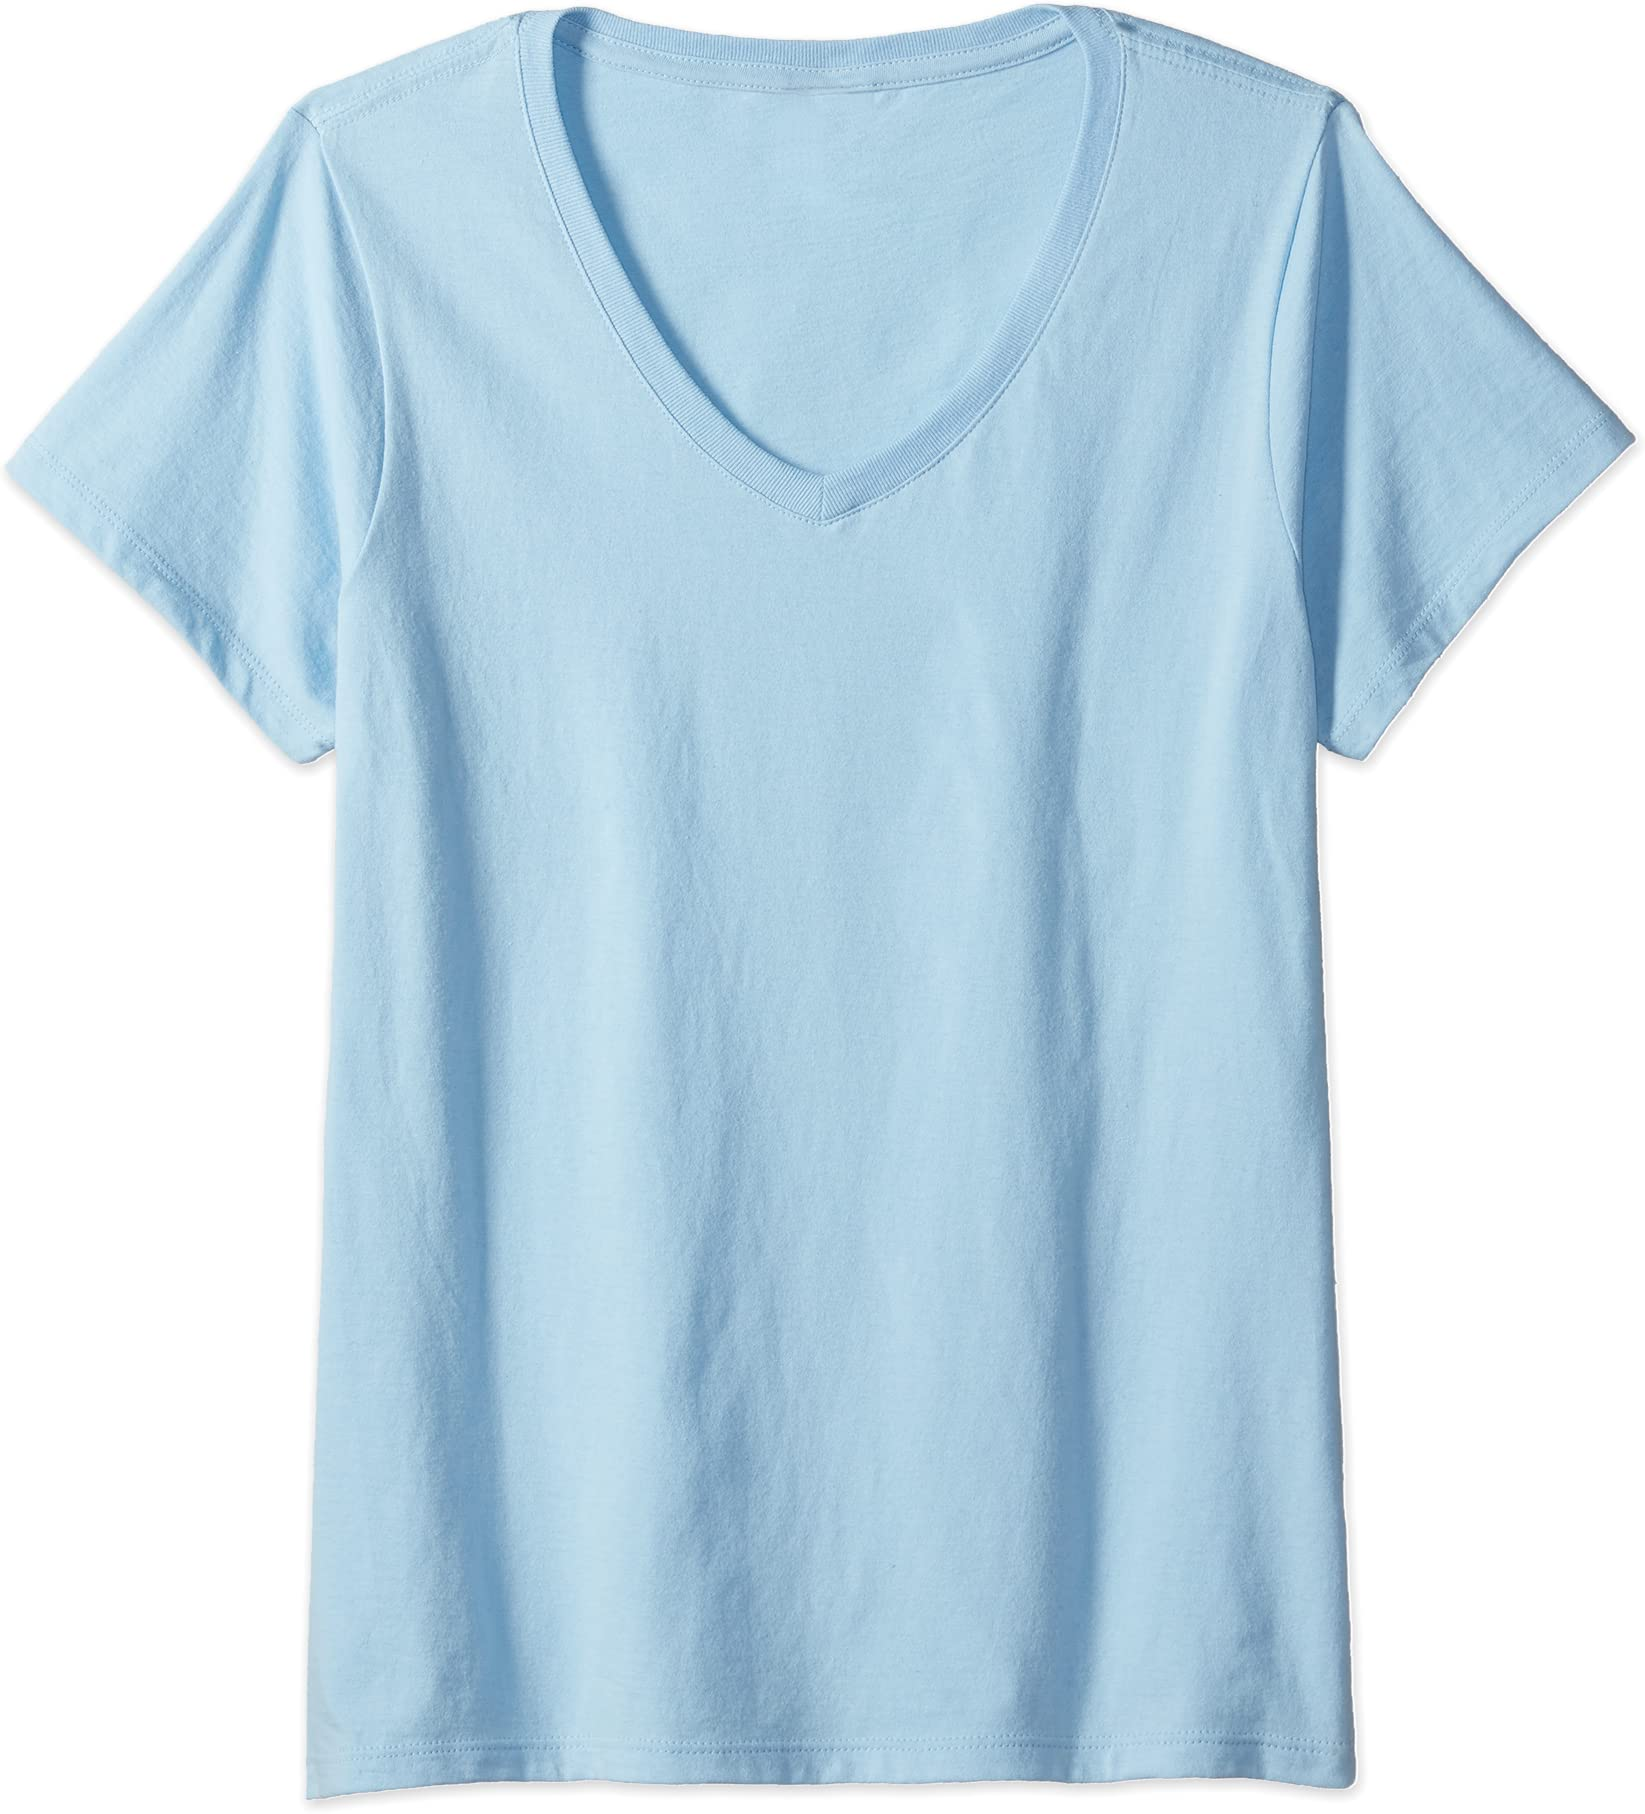 Disney's Frozen Ladies Large Grey T Shirt New Official